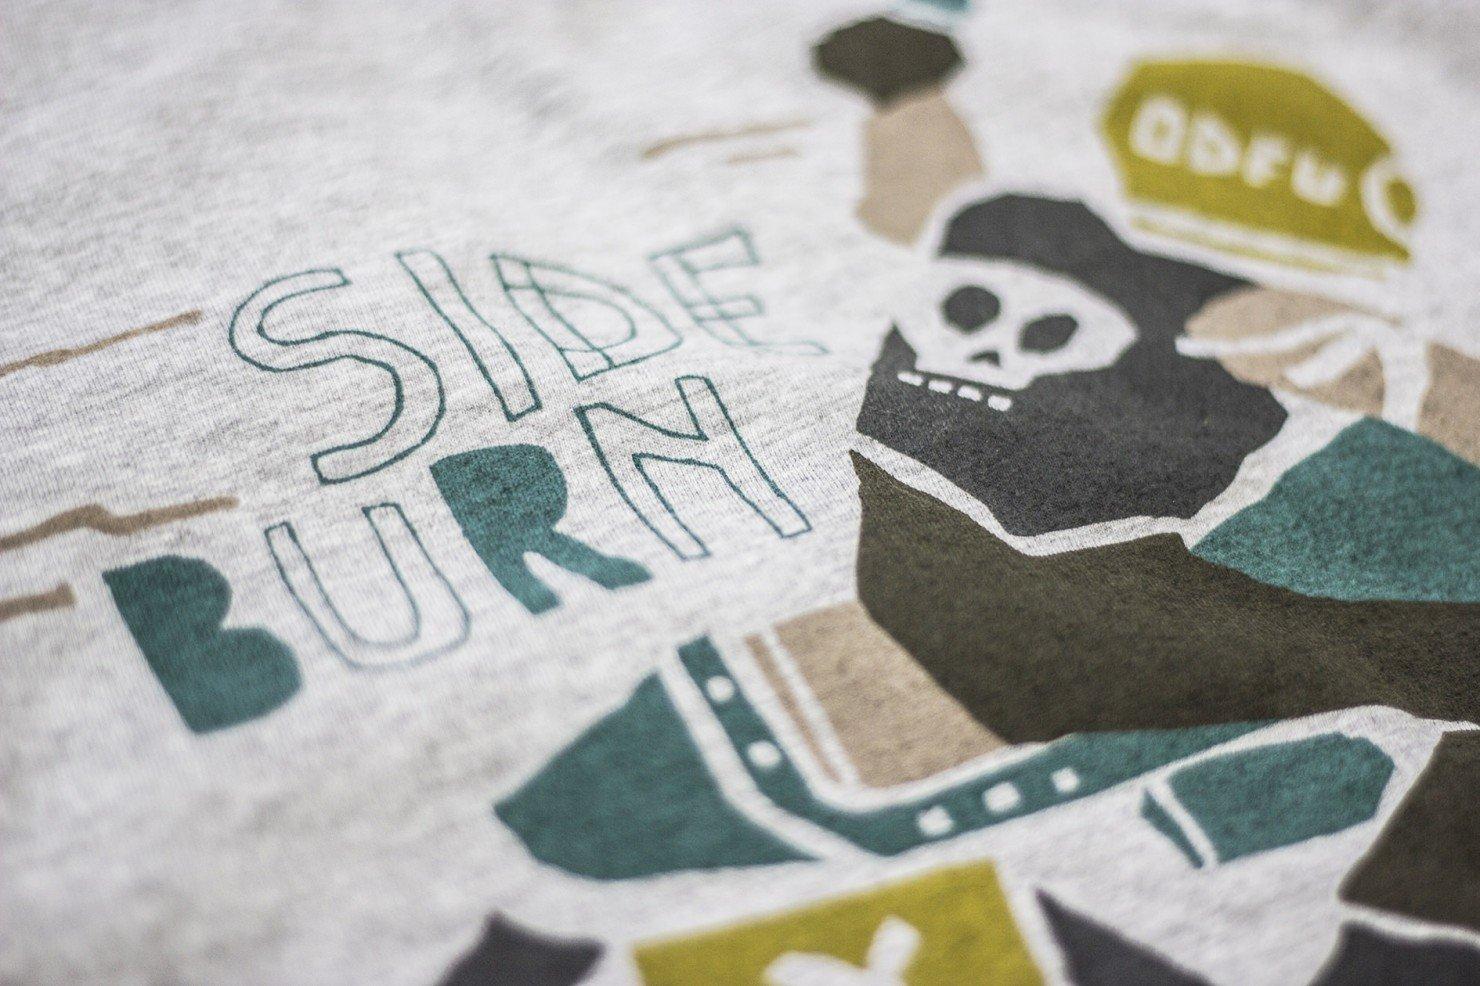 ODFU x Sideburn T-Shirt 2